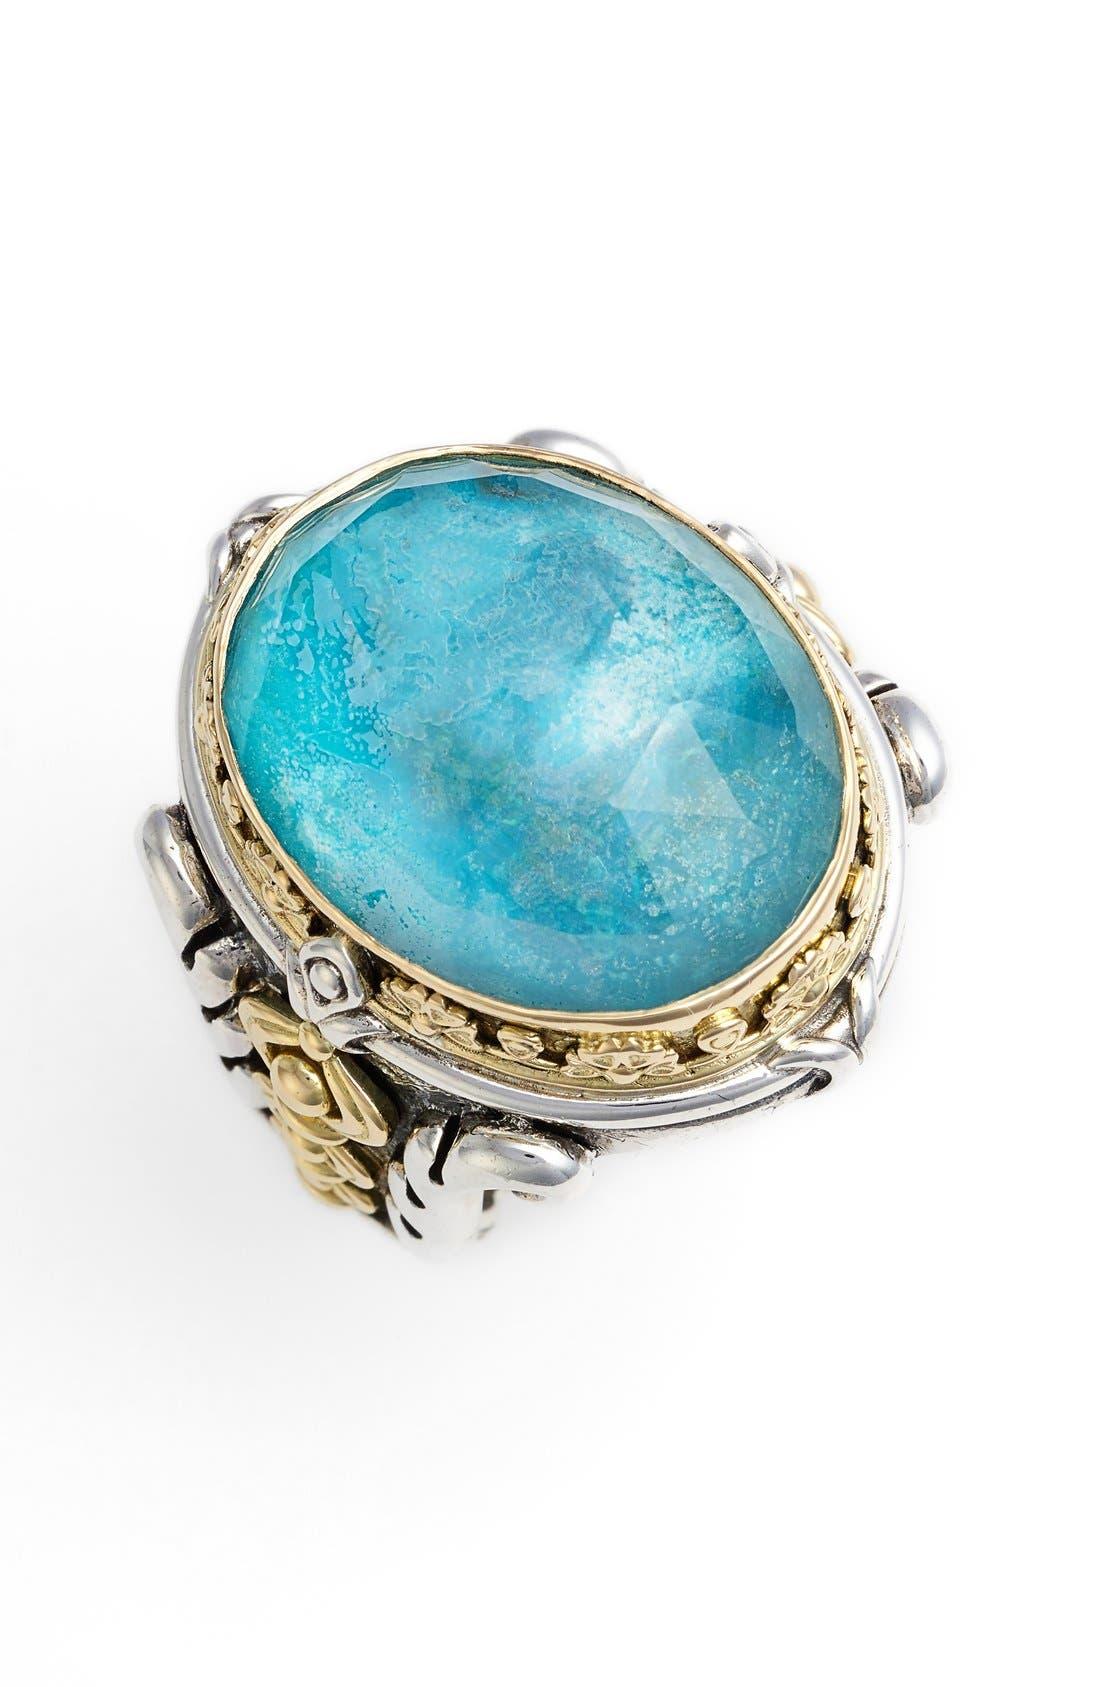 'Iliada' Large Oval Semiprecious Stone Ring,                             Main thumbnail 1, color,                             Blue/ Green